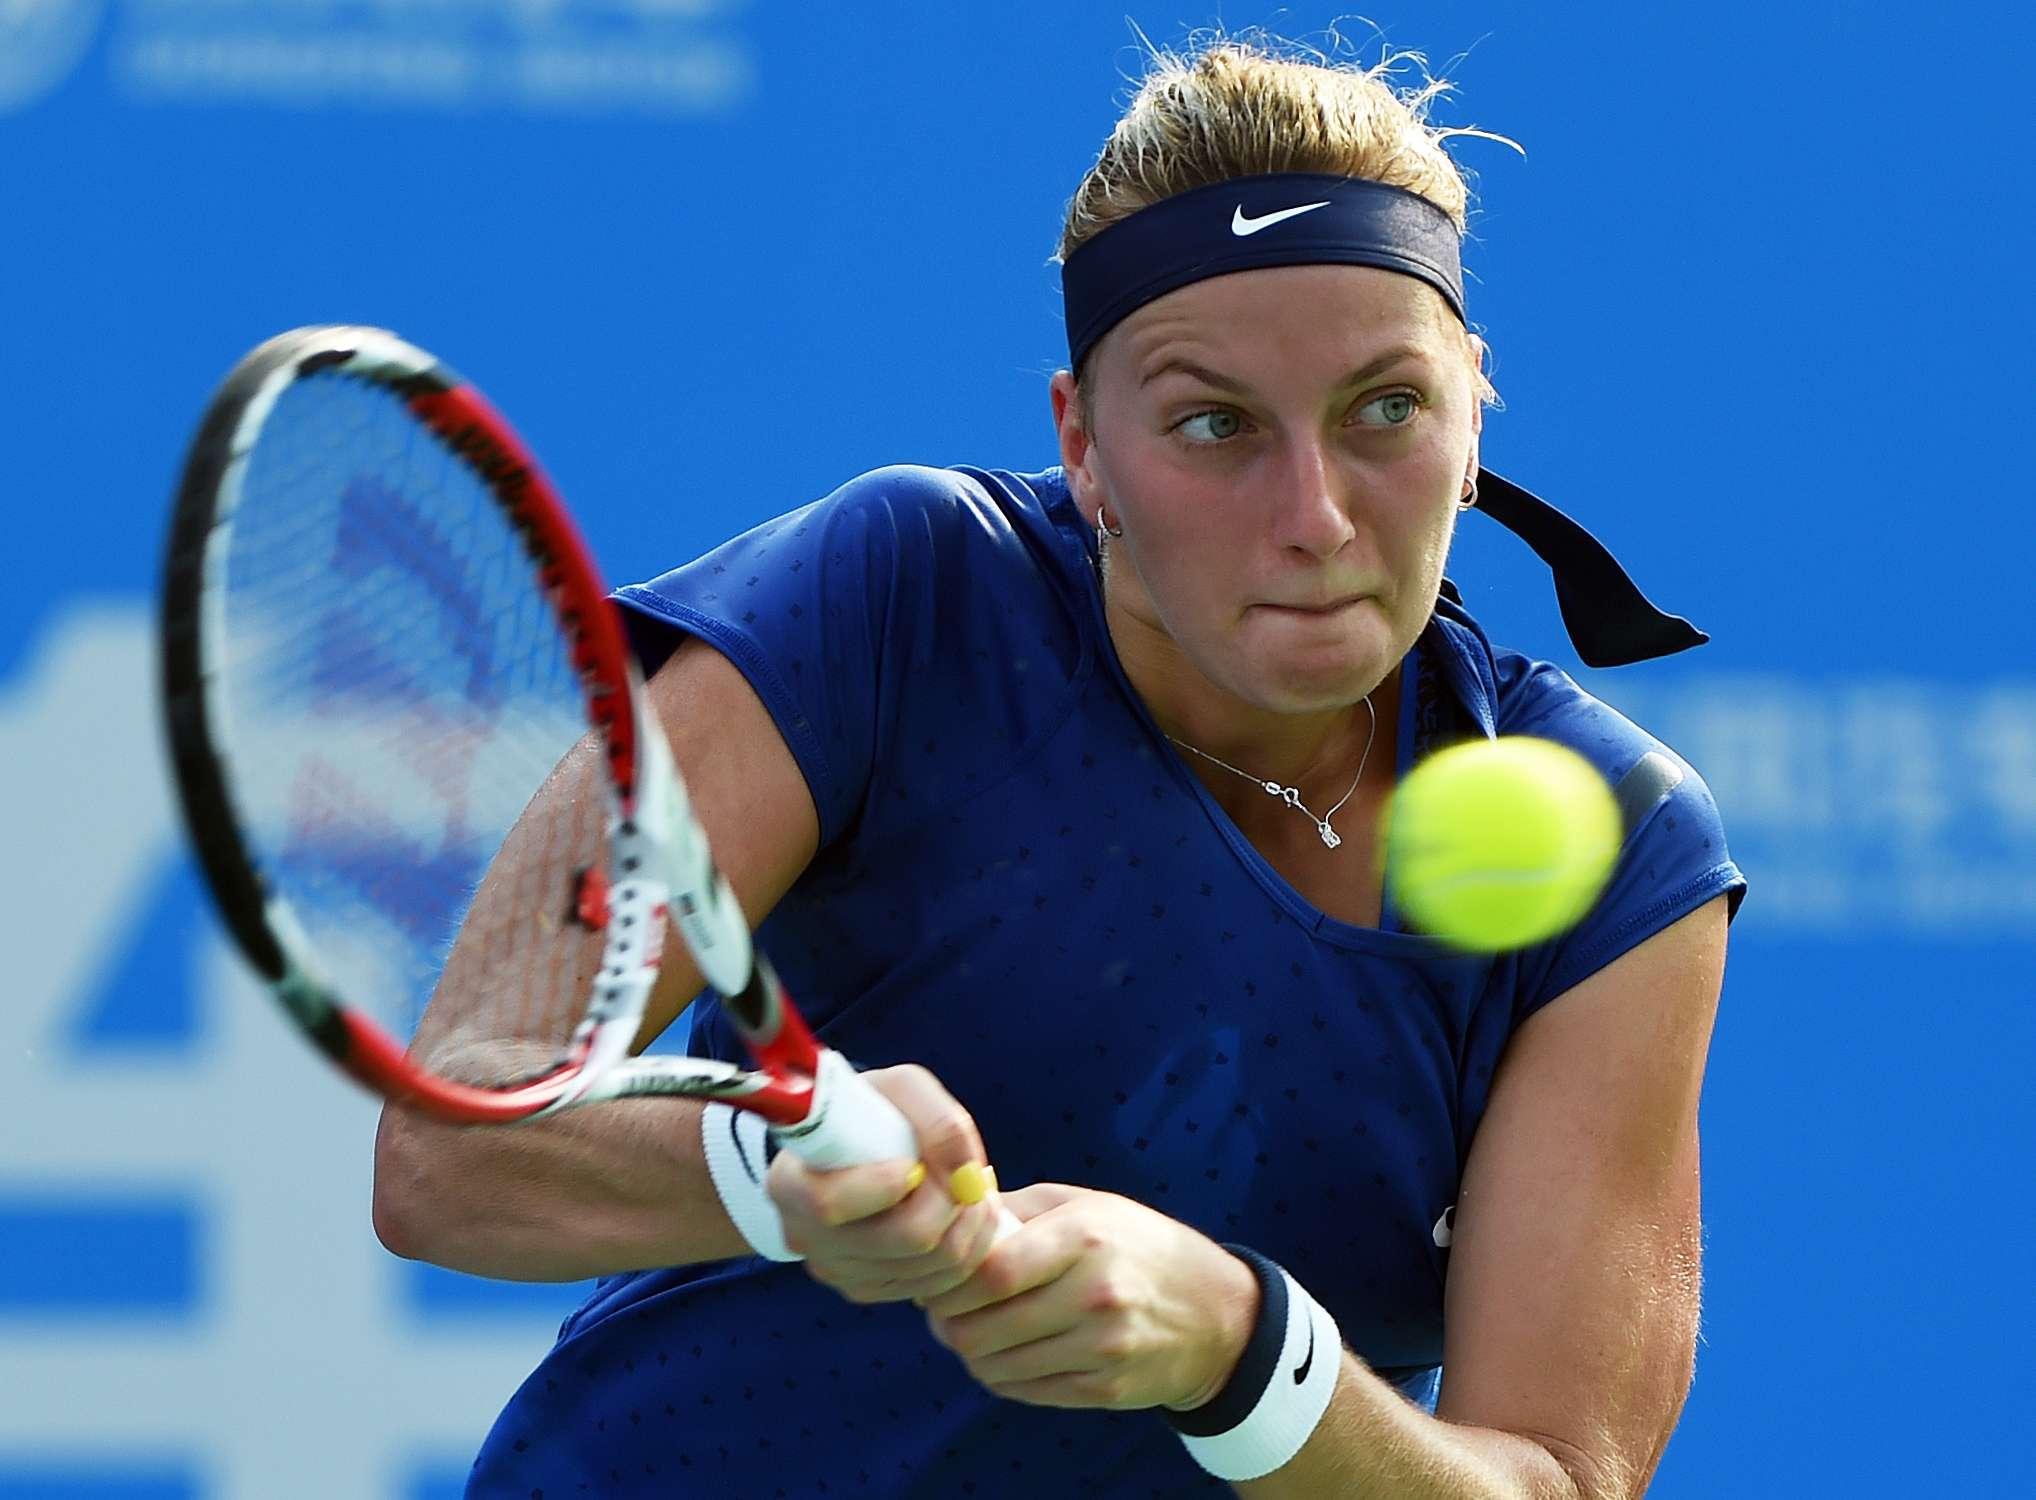 Petra Kvitova ganó su partido. Foto: AFP